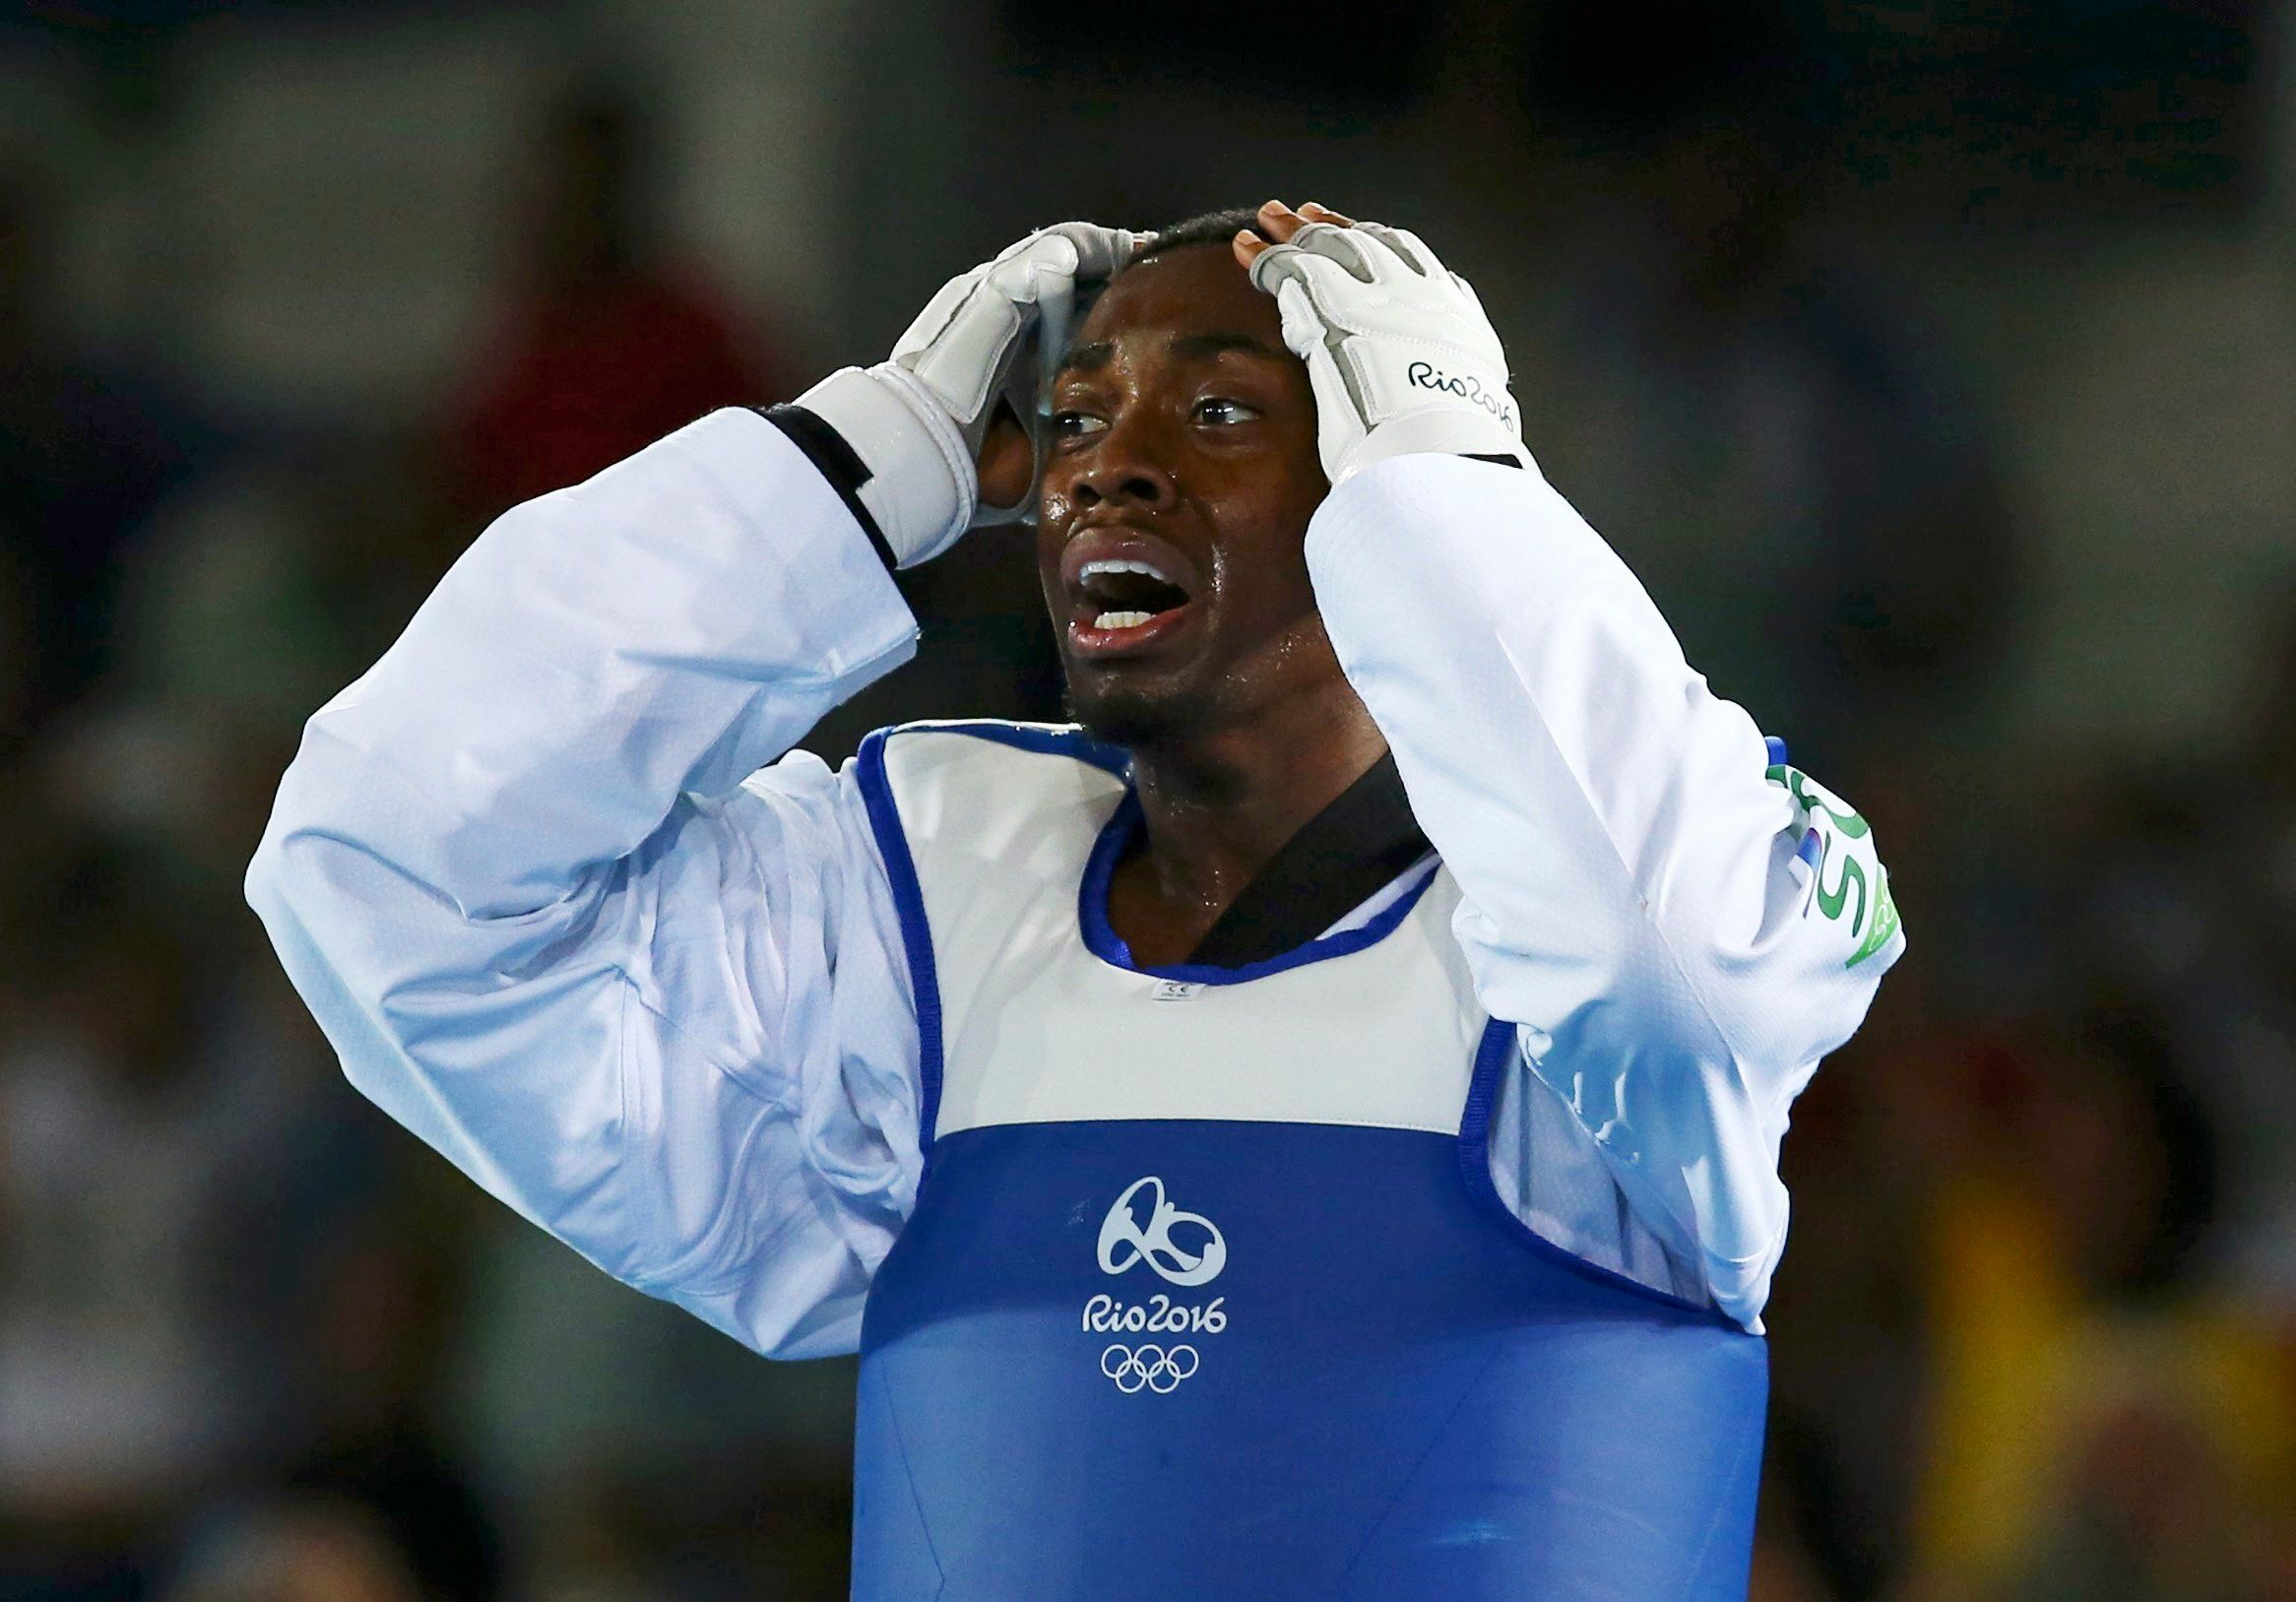 Lutalo Muhammad won silver on Friday